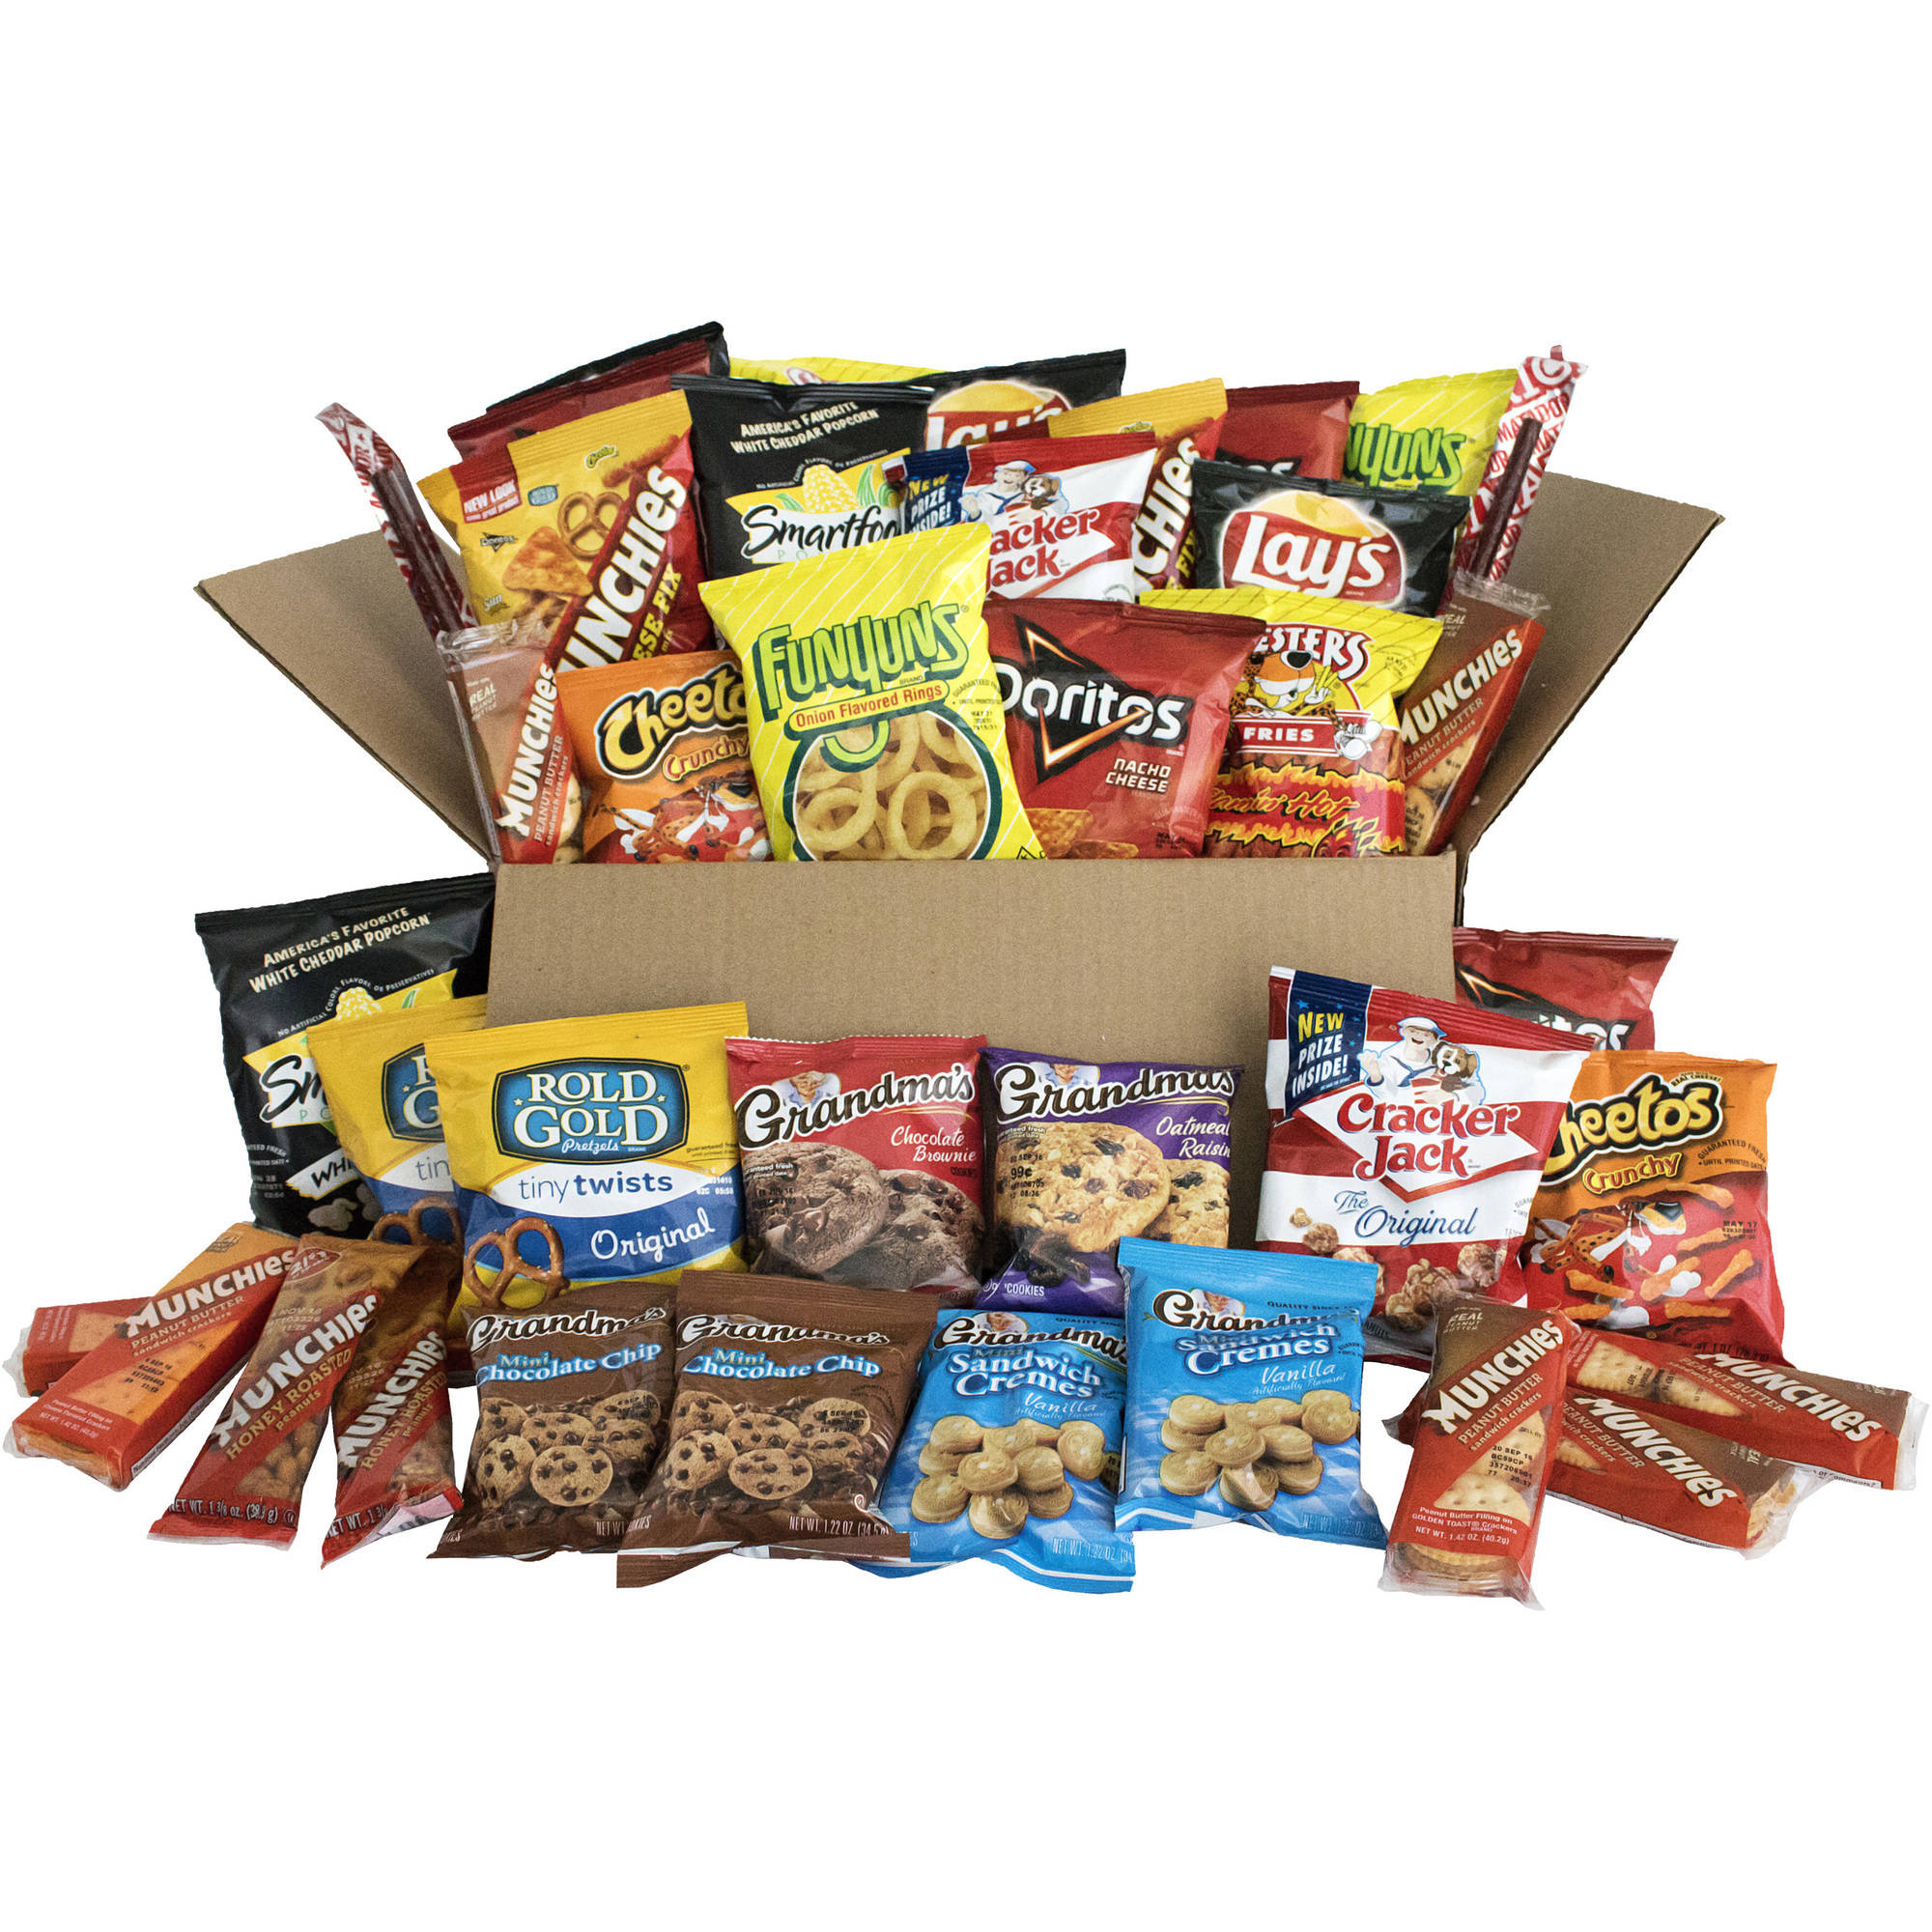 Frito lay stock options